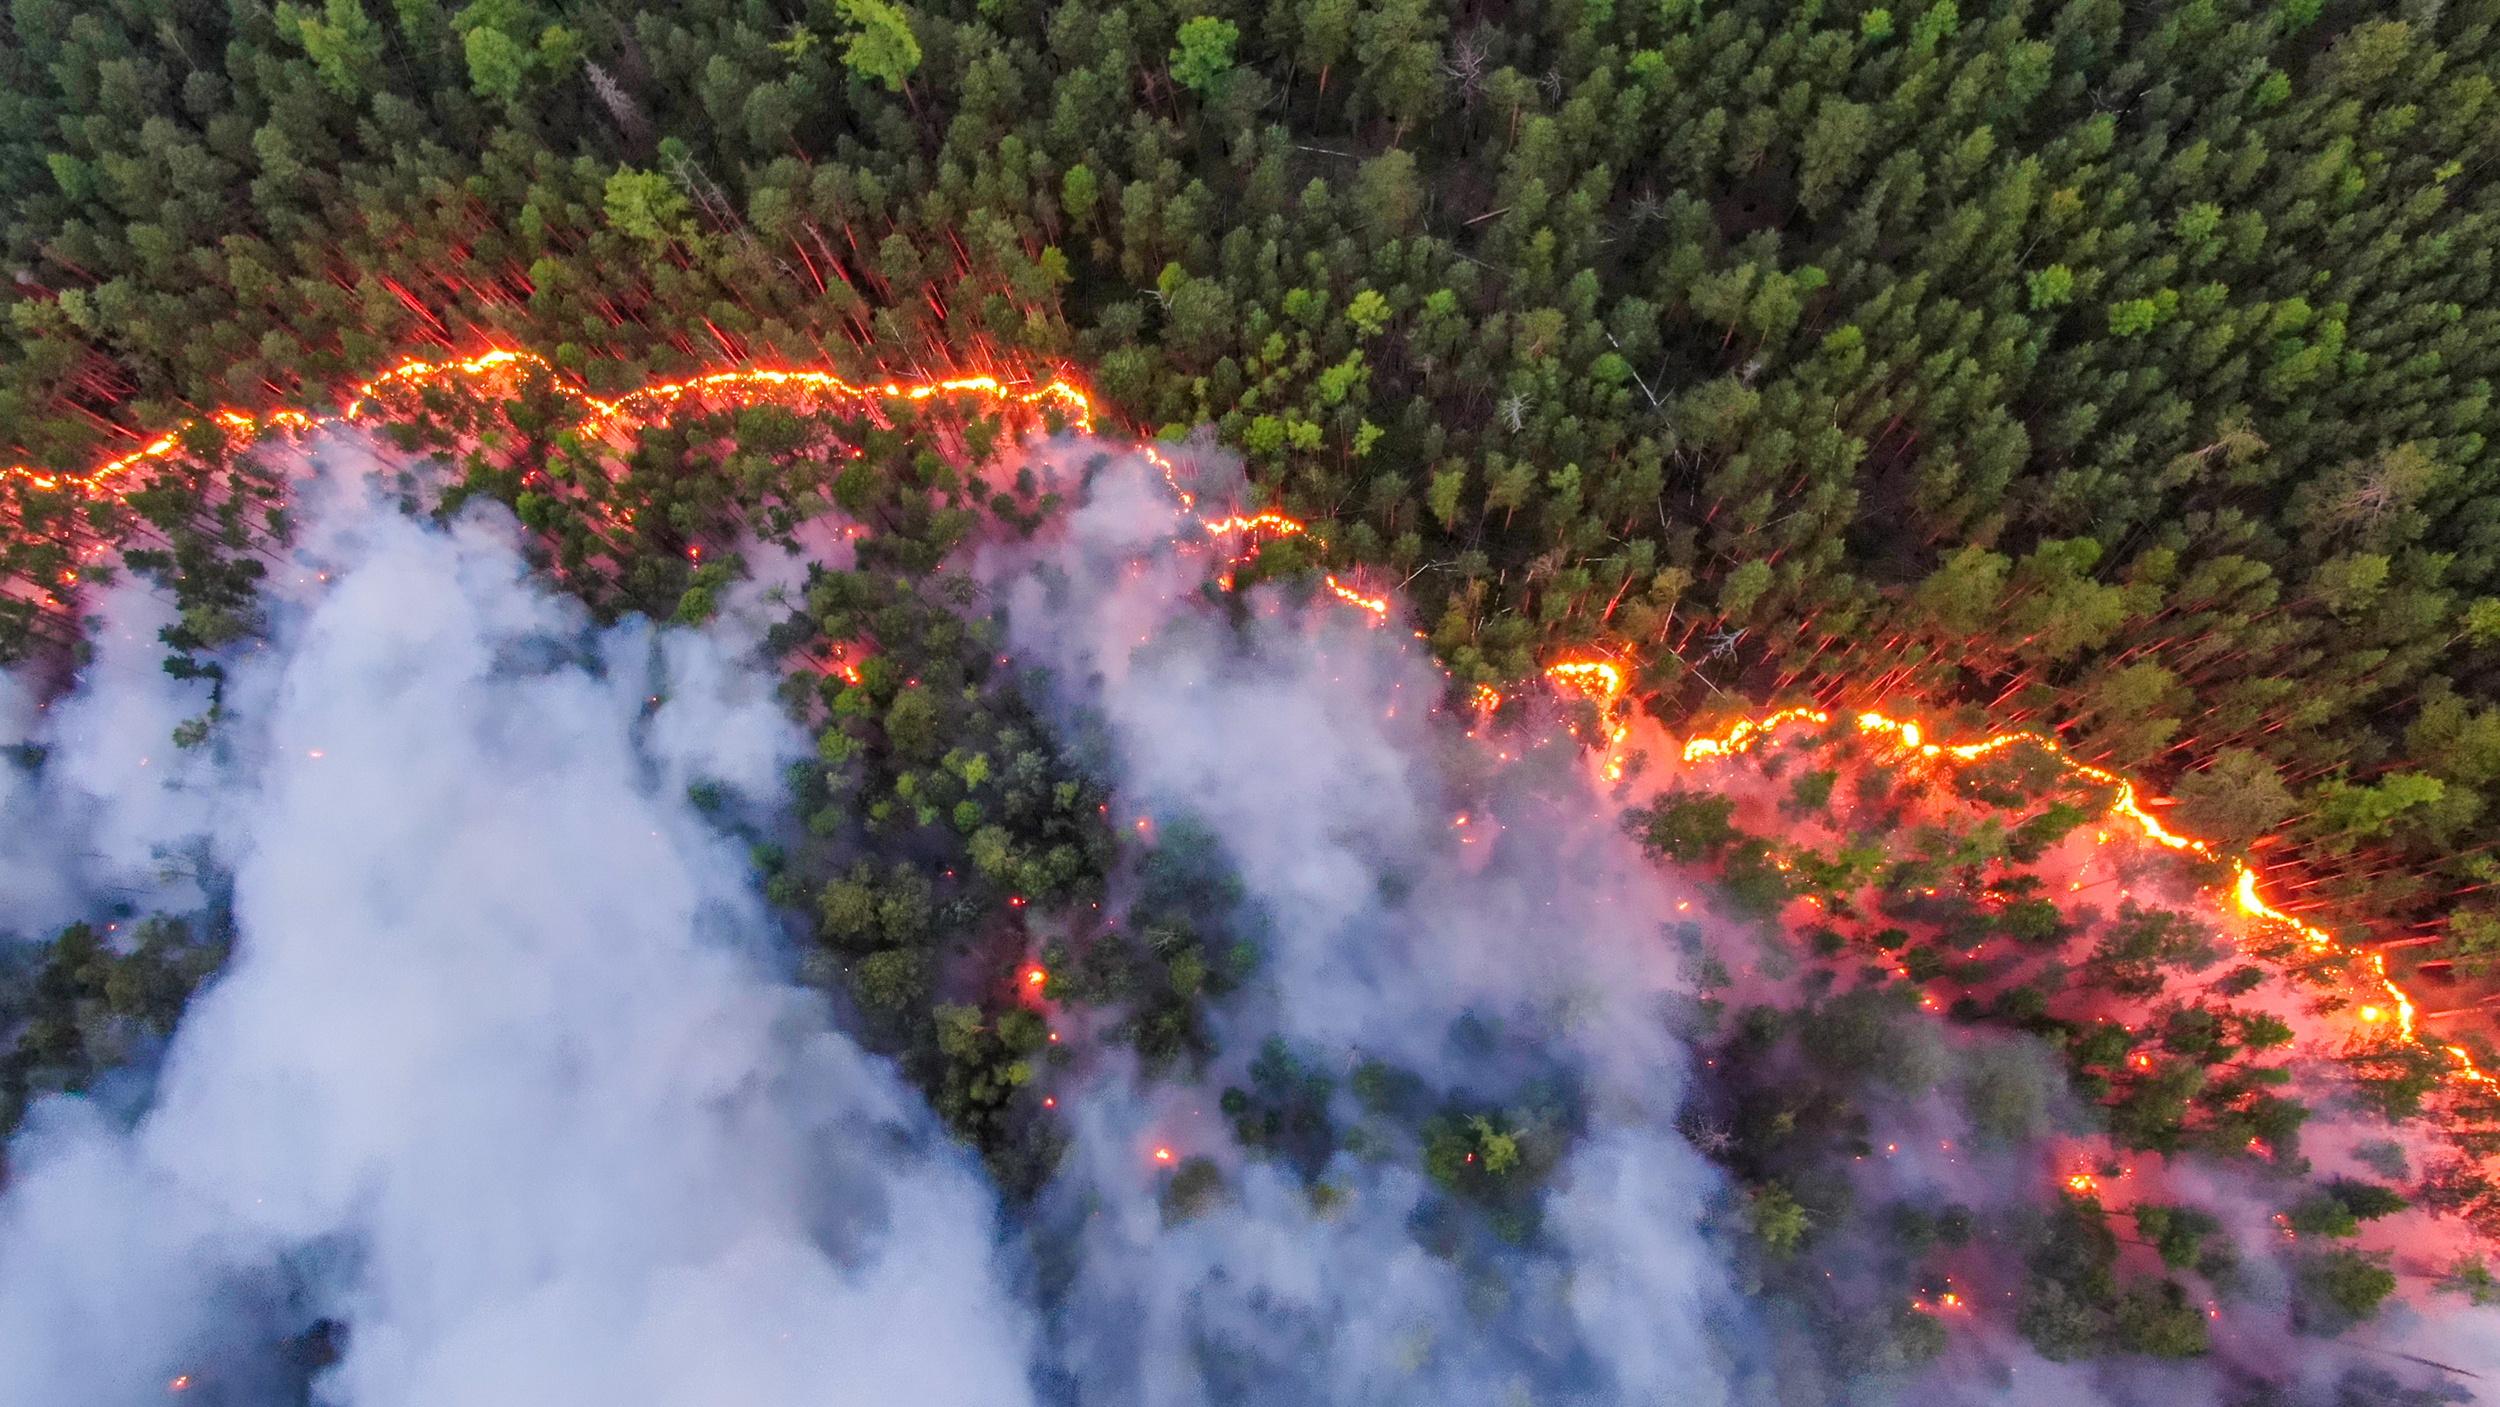 Vista aérea de un incendio en la región de Krasnoyarsk (Julia Petrenko/Greenpeace/Handout via REUTERS)